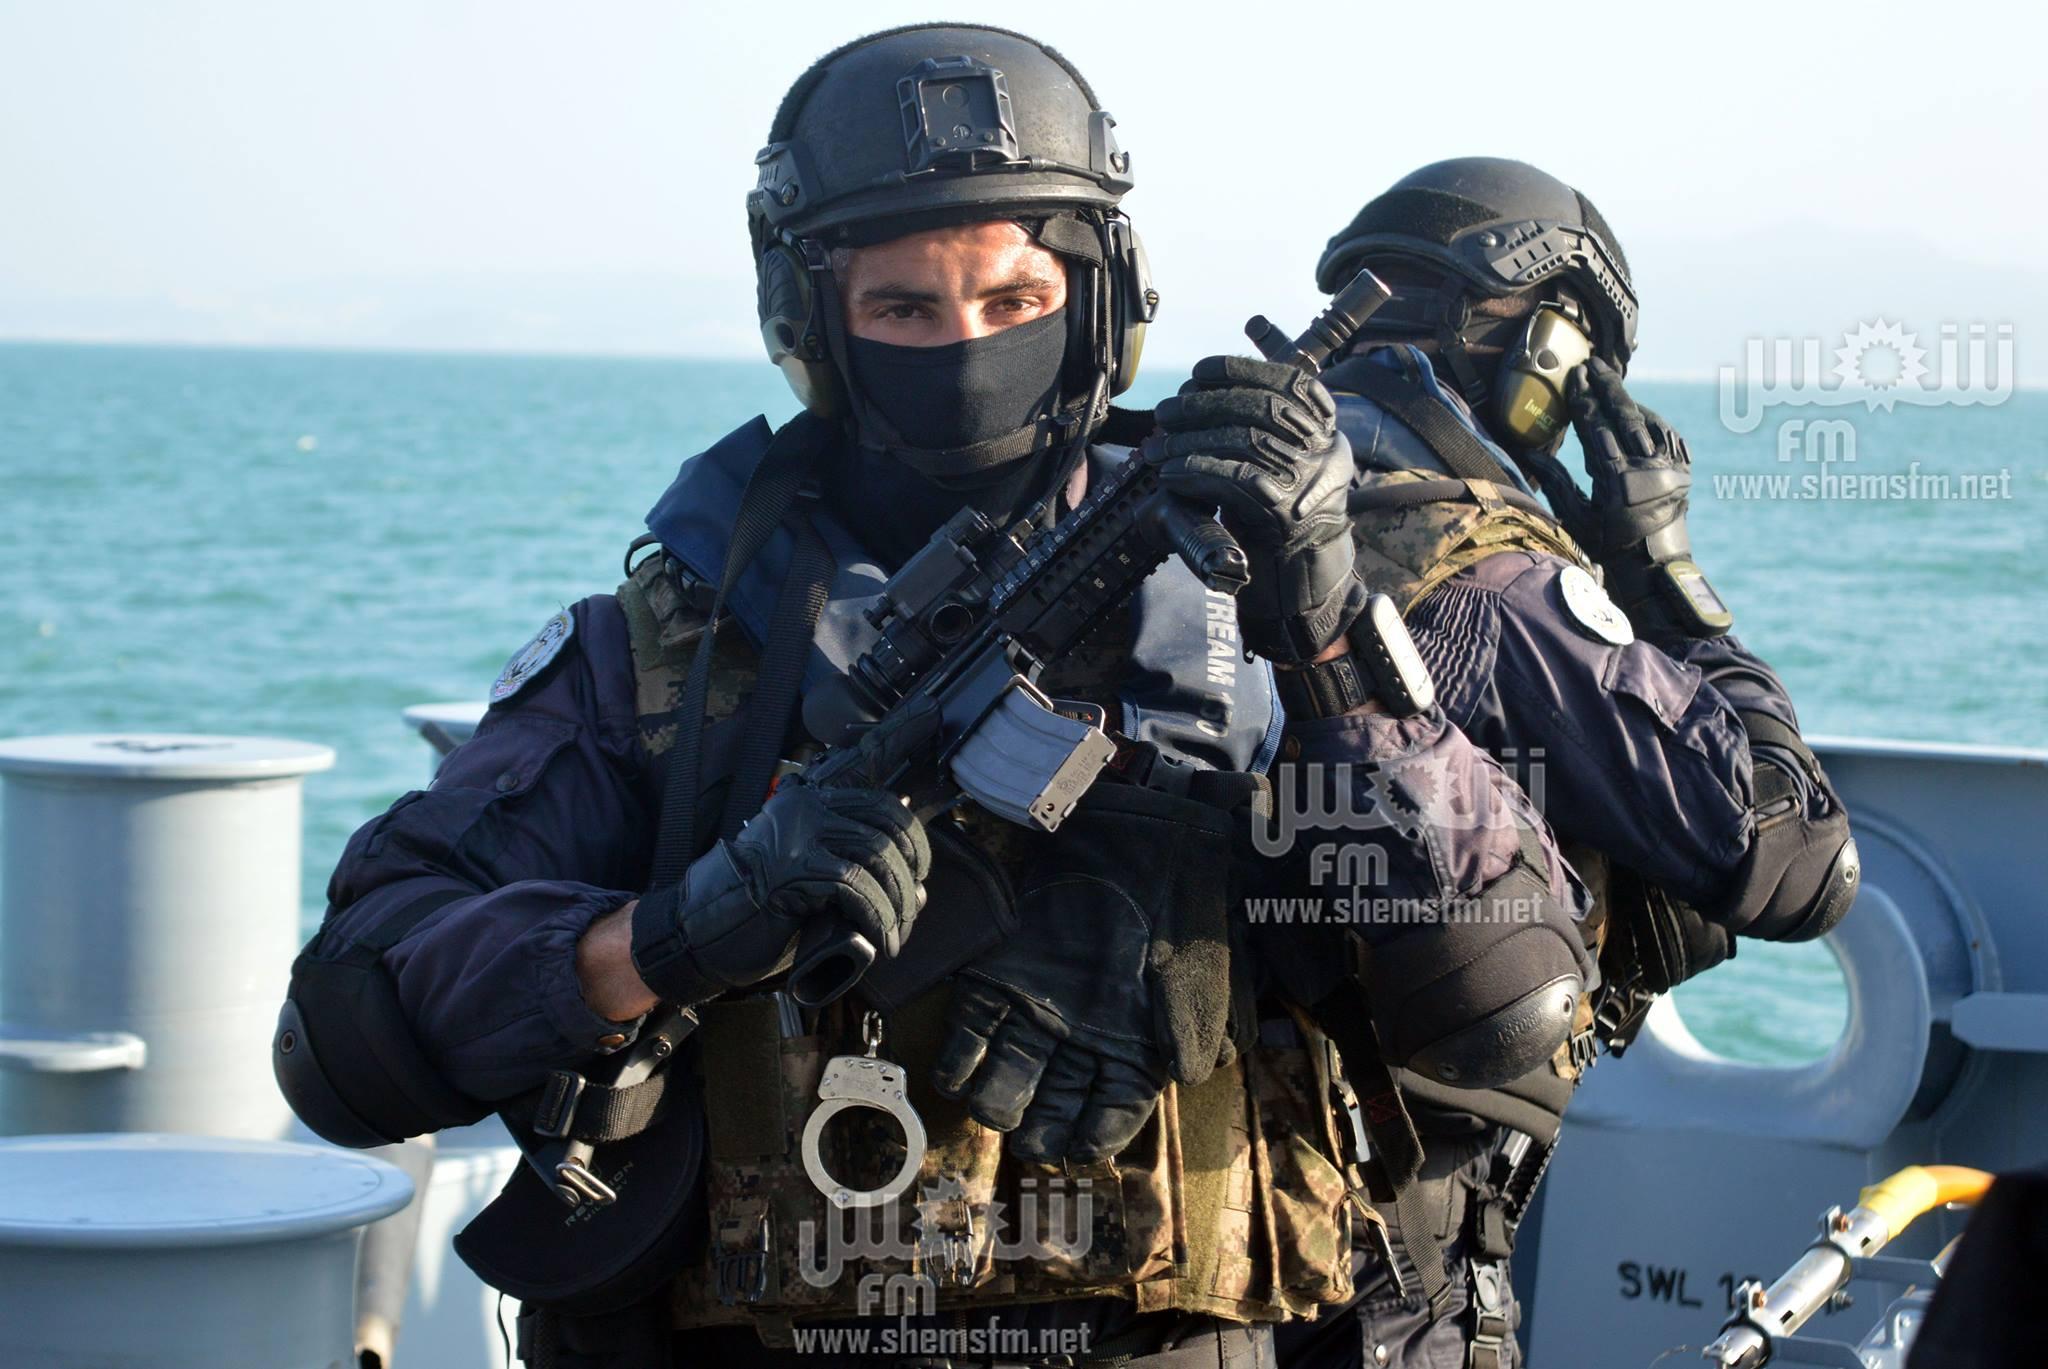 Armée Tunisienne / Tunisian Armed Forces / القوات المسلحة التونسية - Page 16 57774976-2455595594461711-2019357433461211136-o